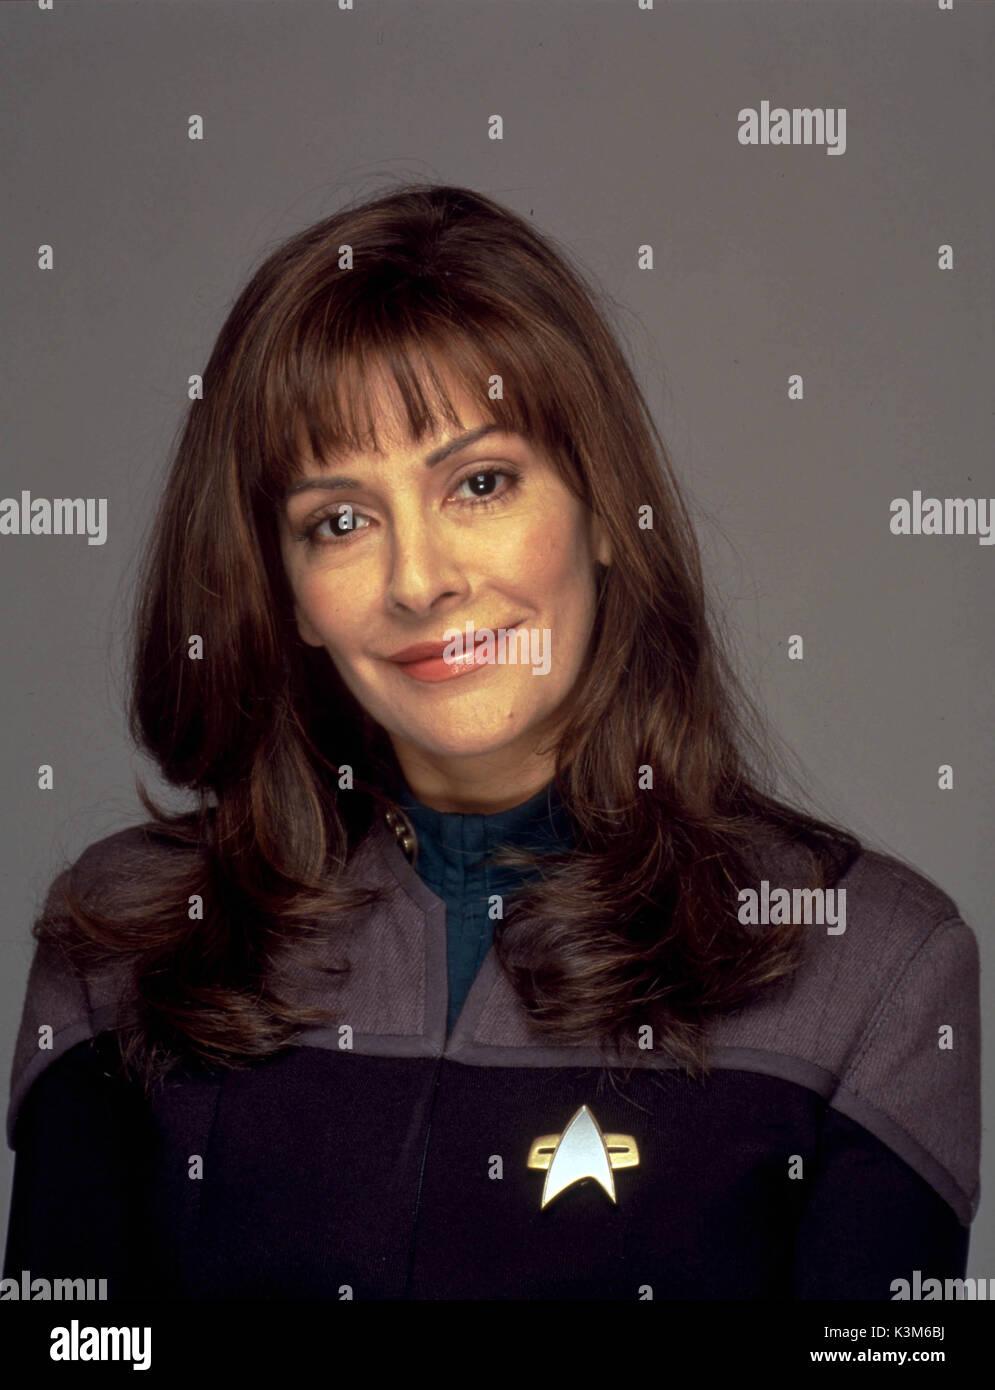 Marina sirtis aka counselor deanna troi - 2 part 6